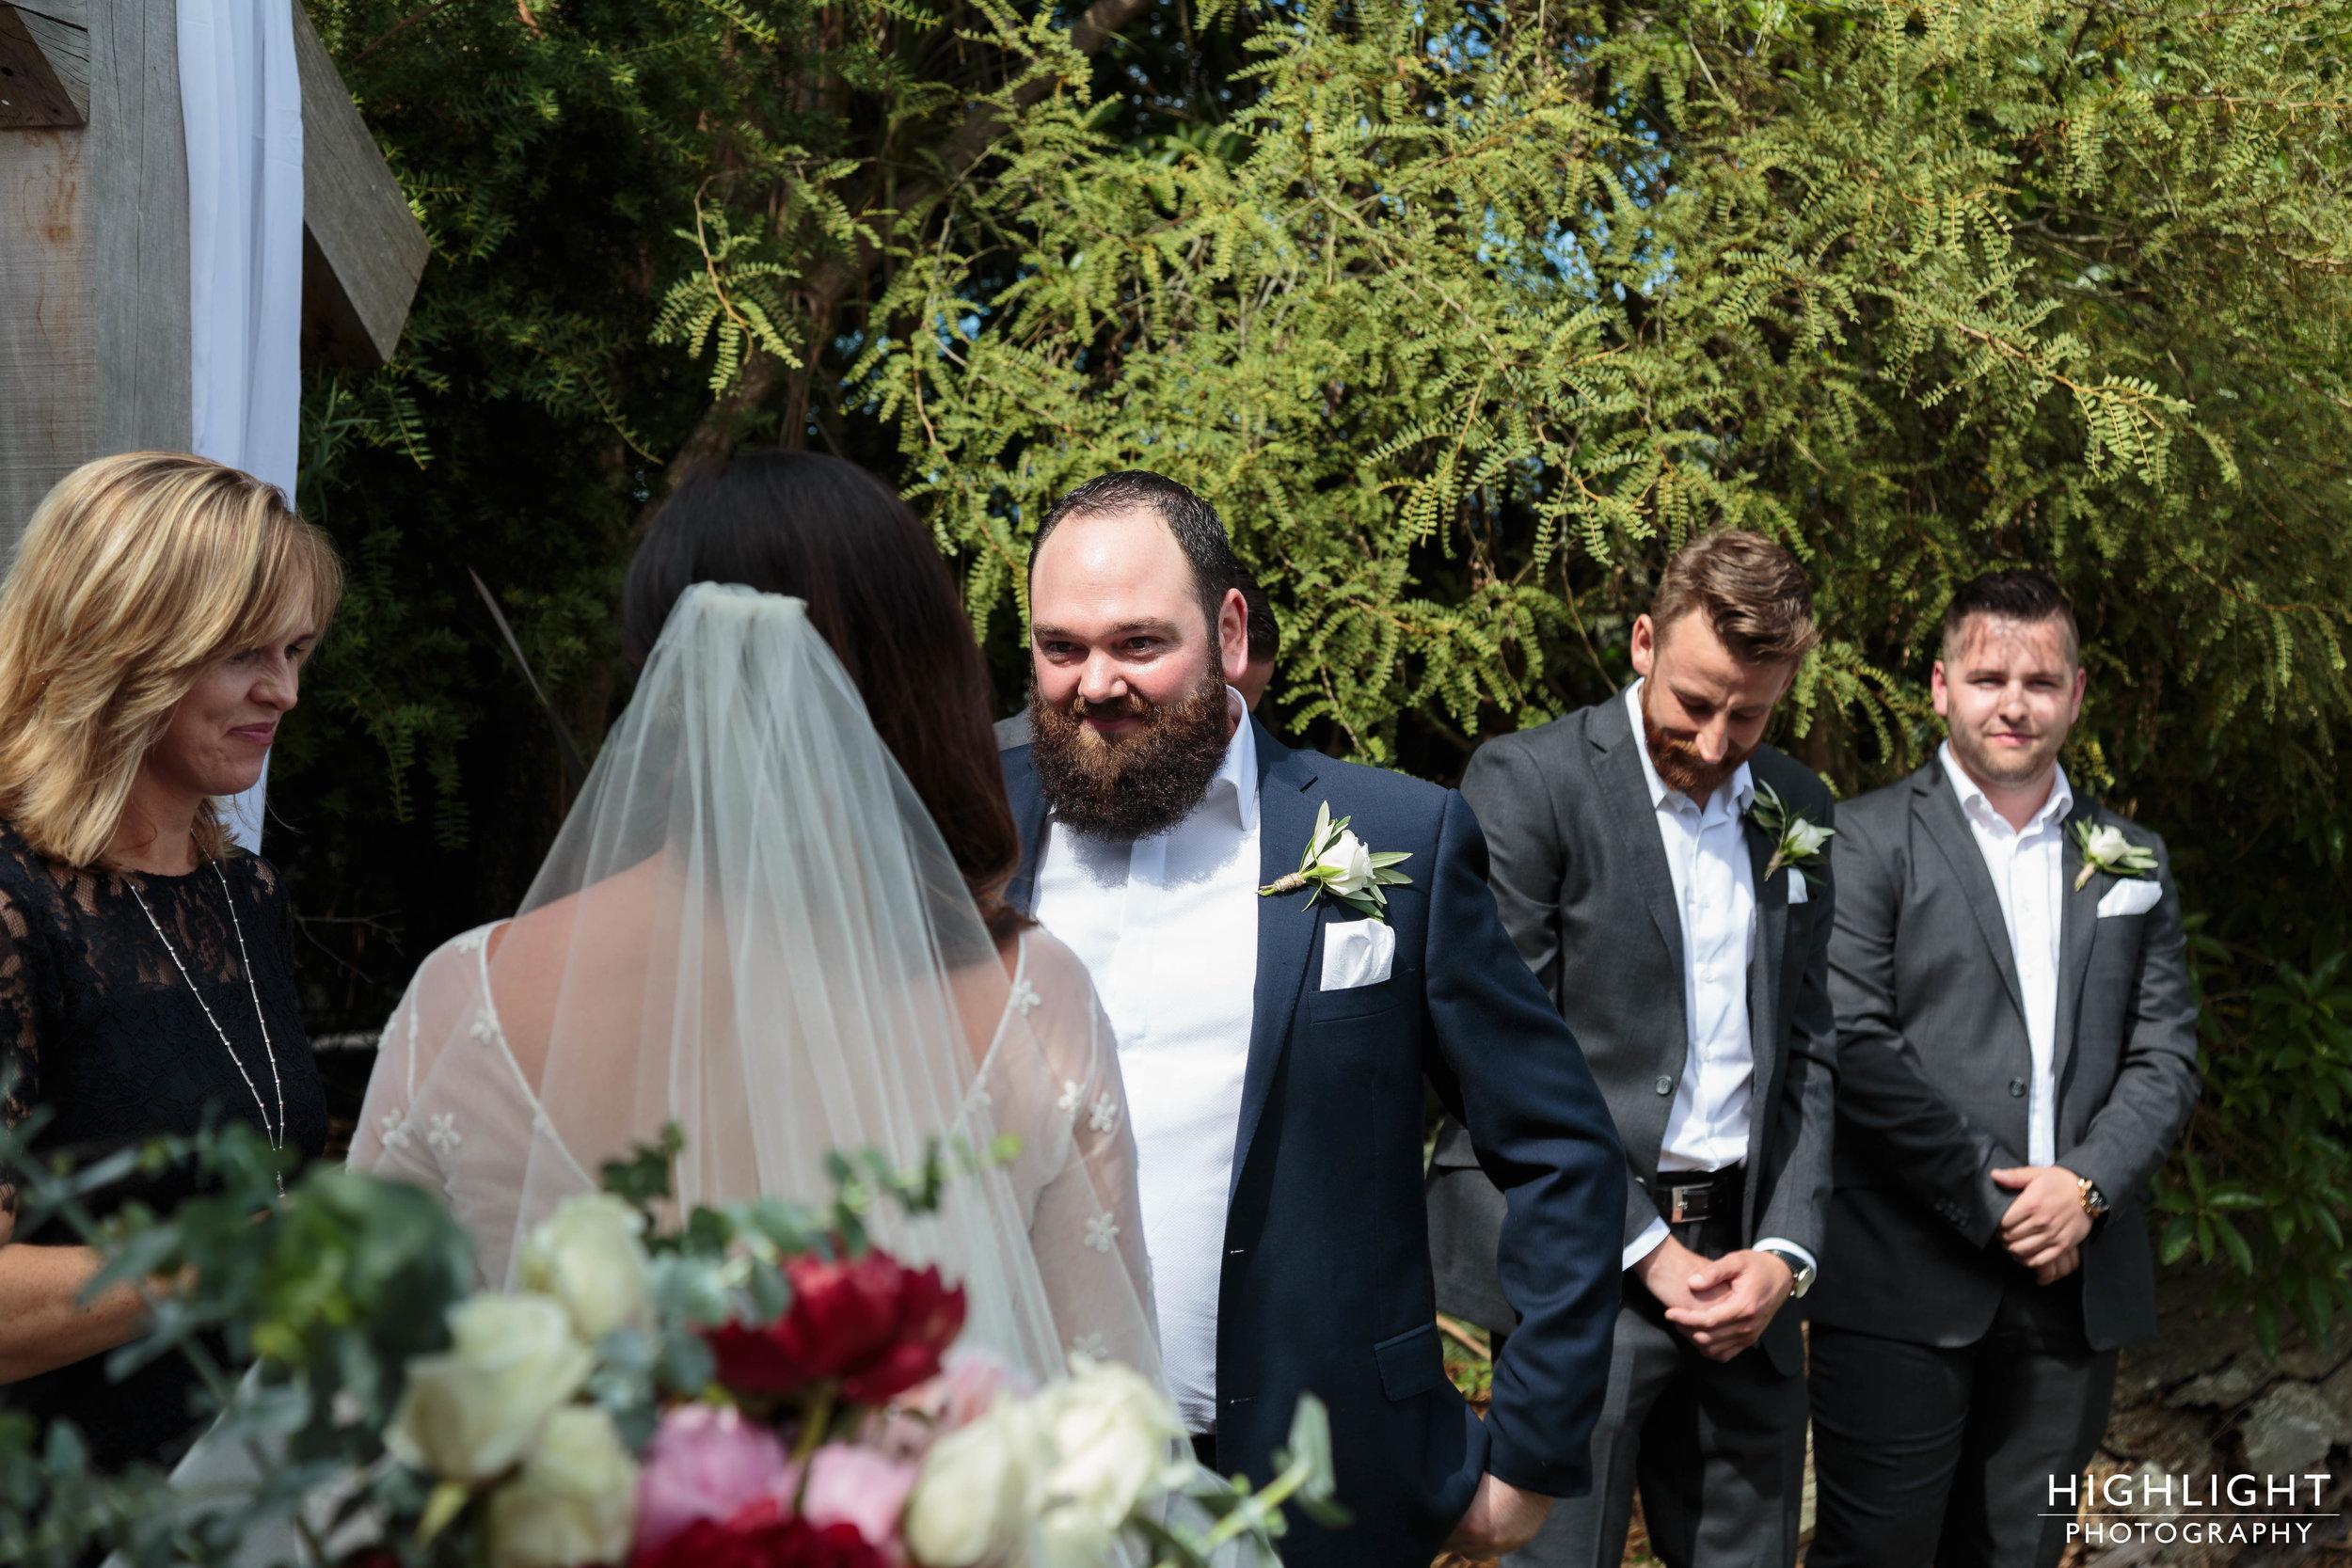 highlight-wedding-photography-new-zealand-makoura-lodge-wedding-60.jpg